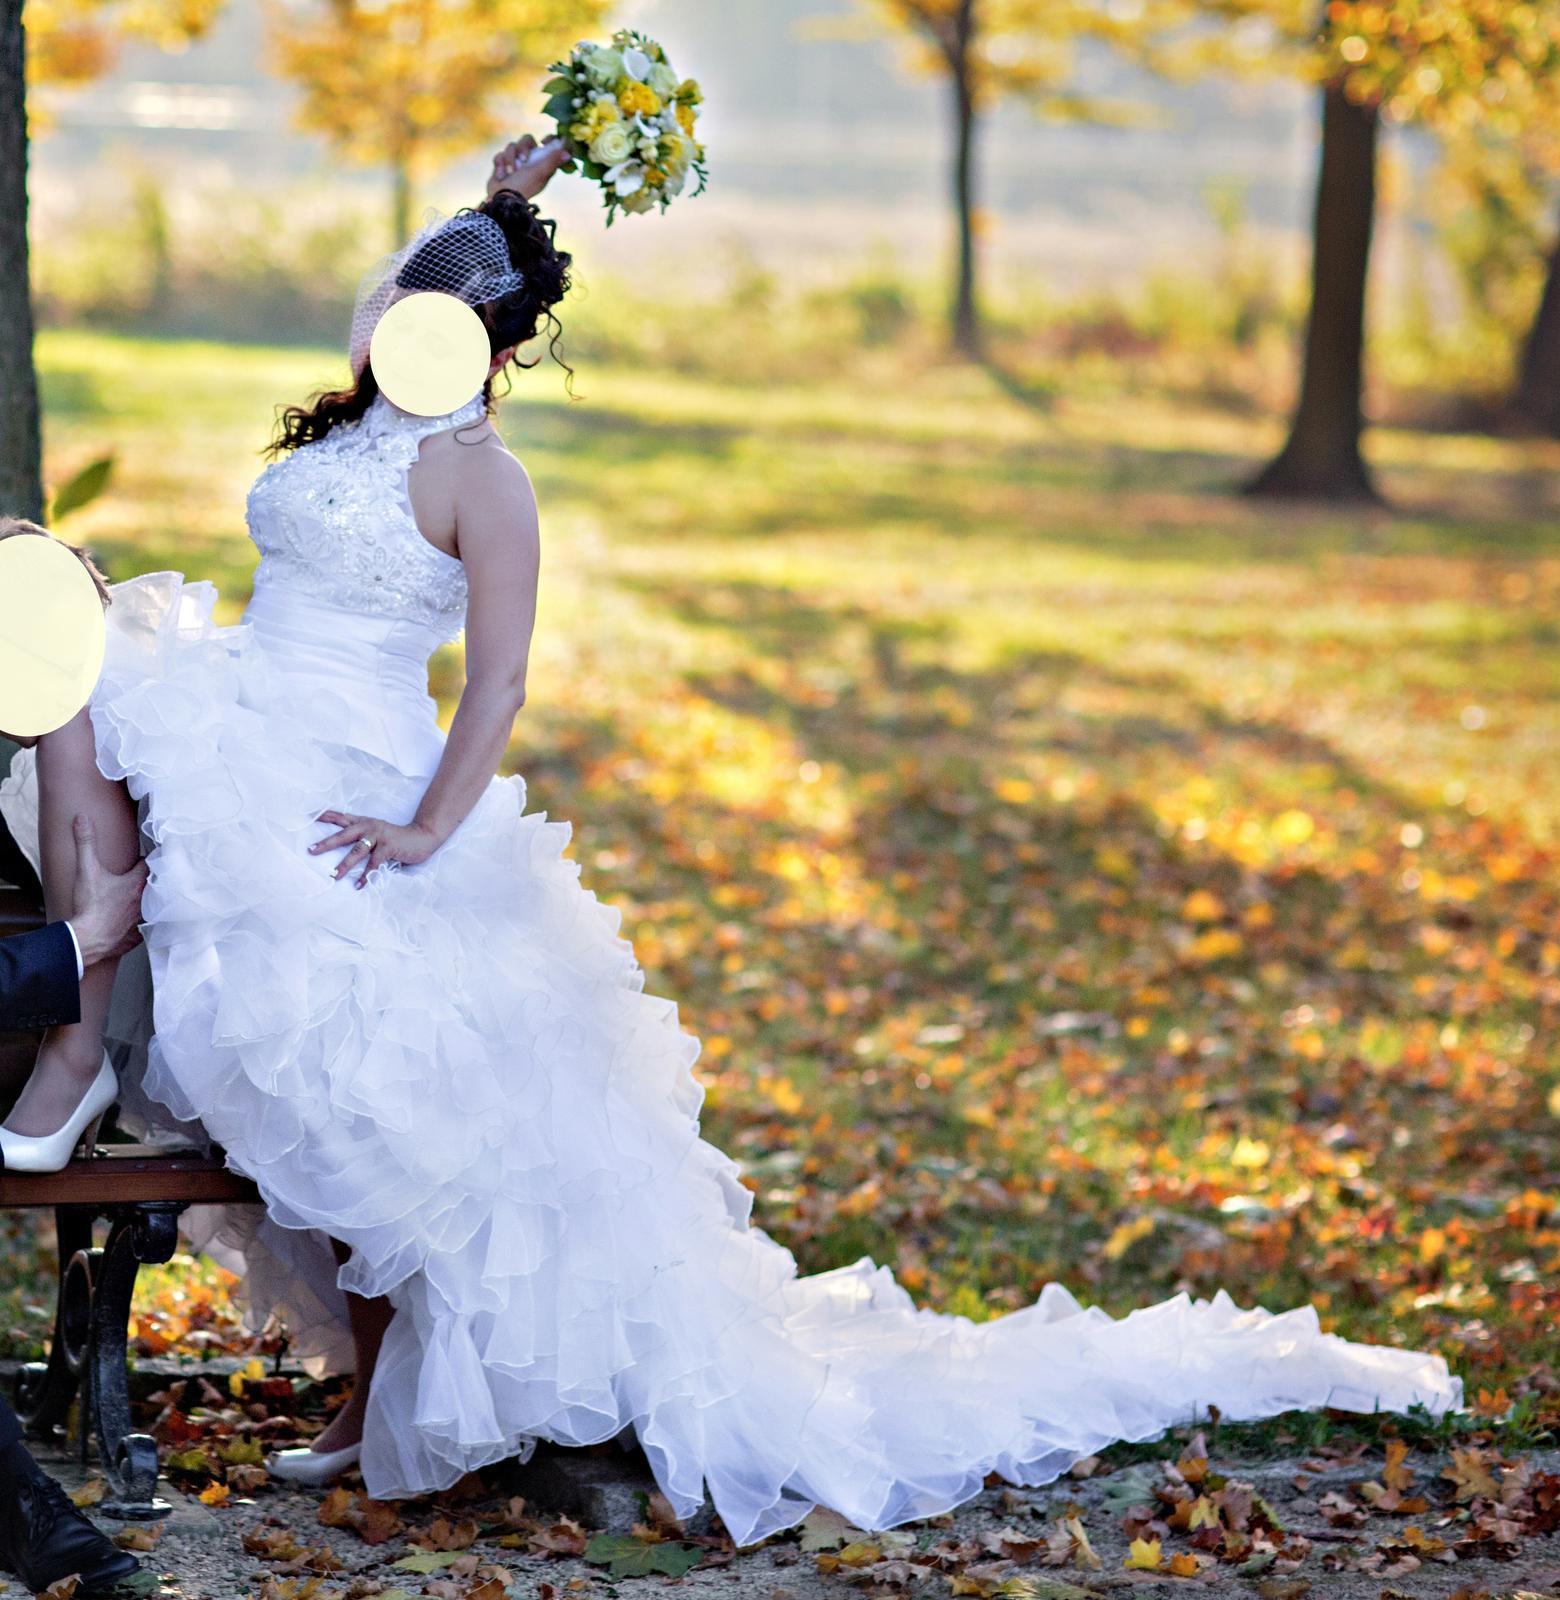 Svadobné šaty vyšívané perličkami - veľ. 38-42 - Obrázek č. 1